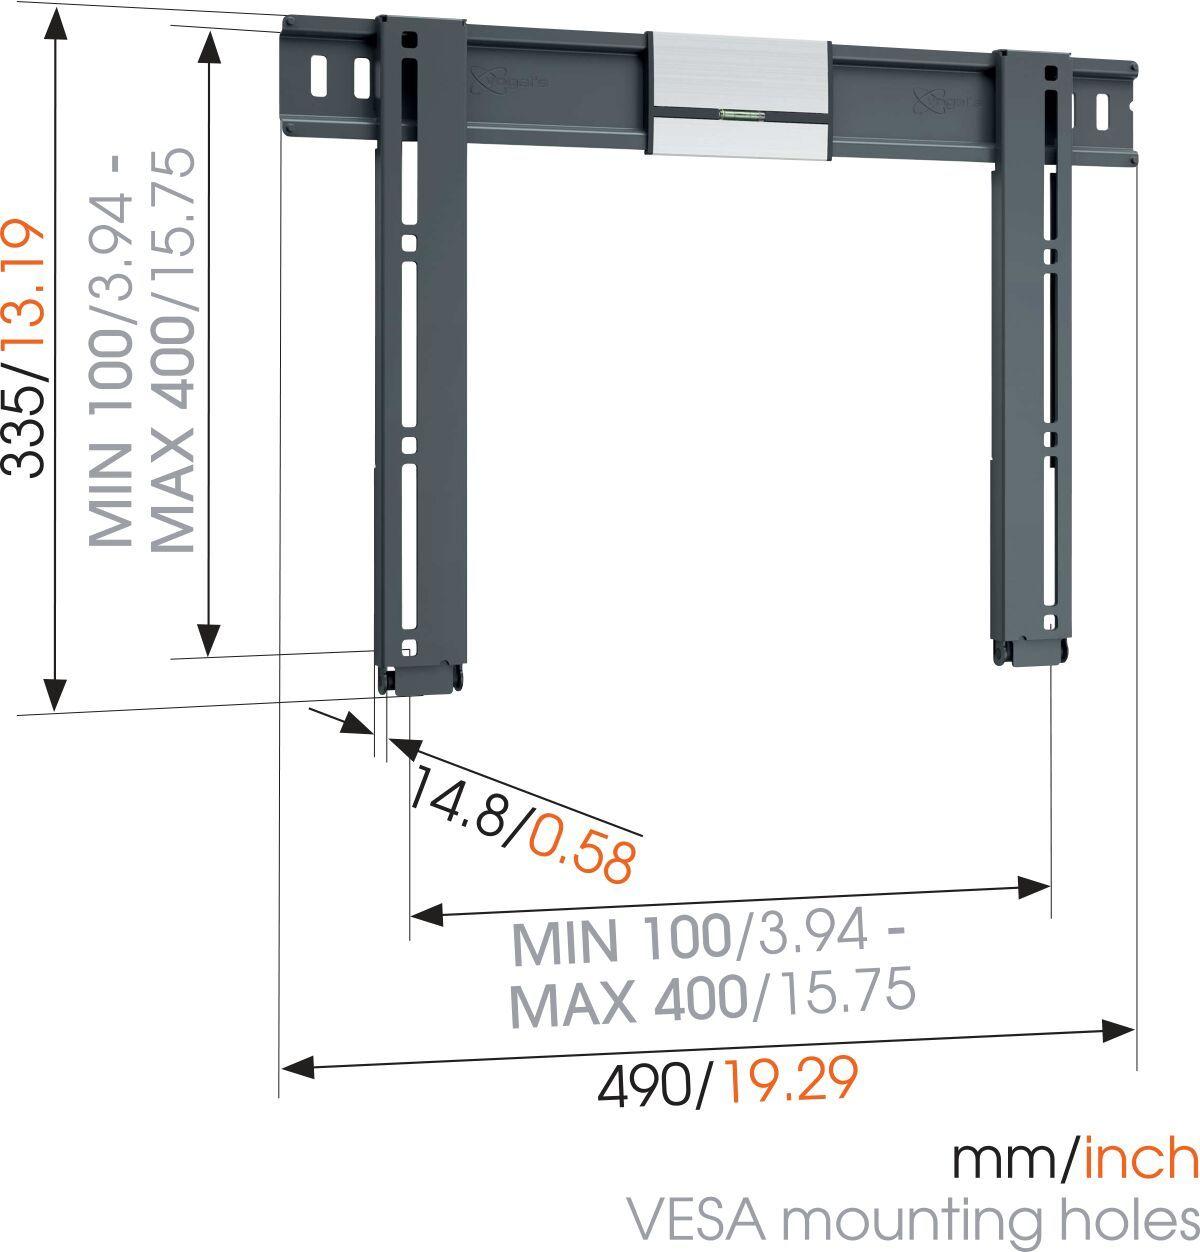 Vogel's THIN 405 ExtraThin фиксированный кронштейн для телевизора - Подходит для телевизоров от 26 до 55 дюймов до 25 кг - Dimensions